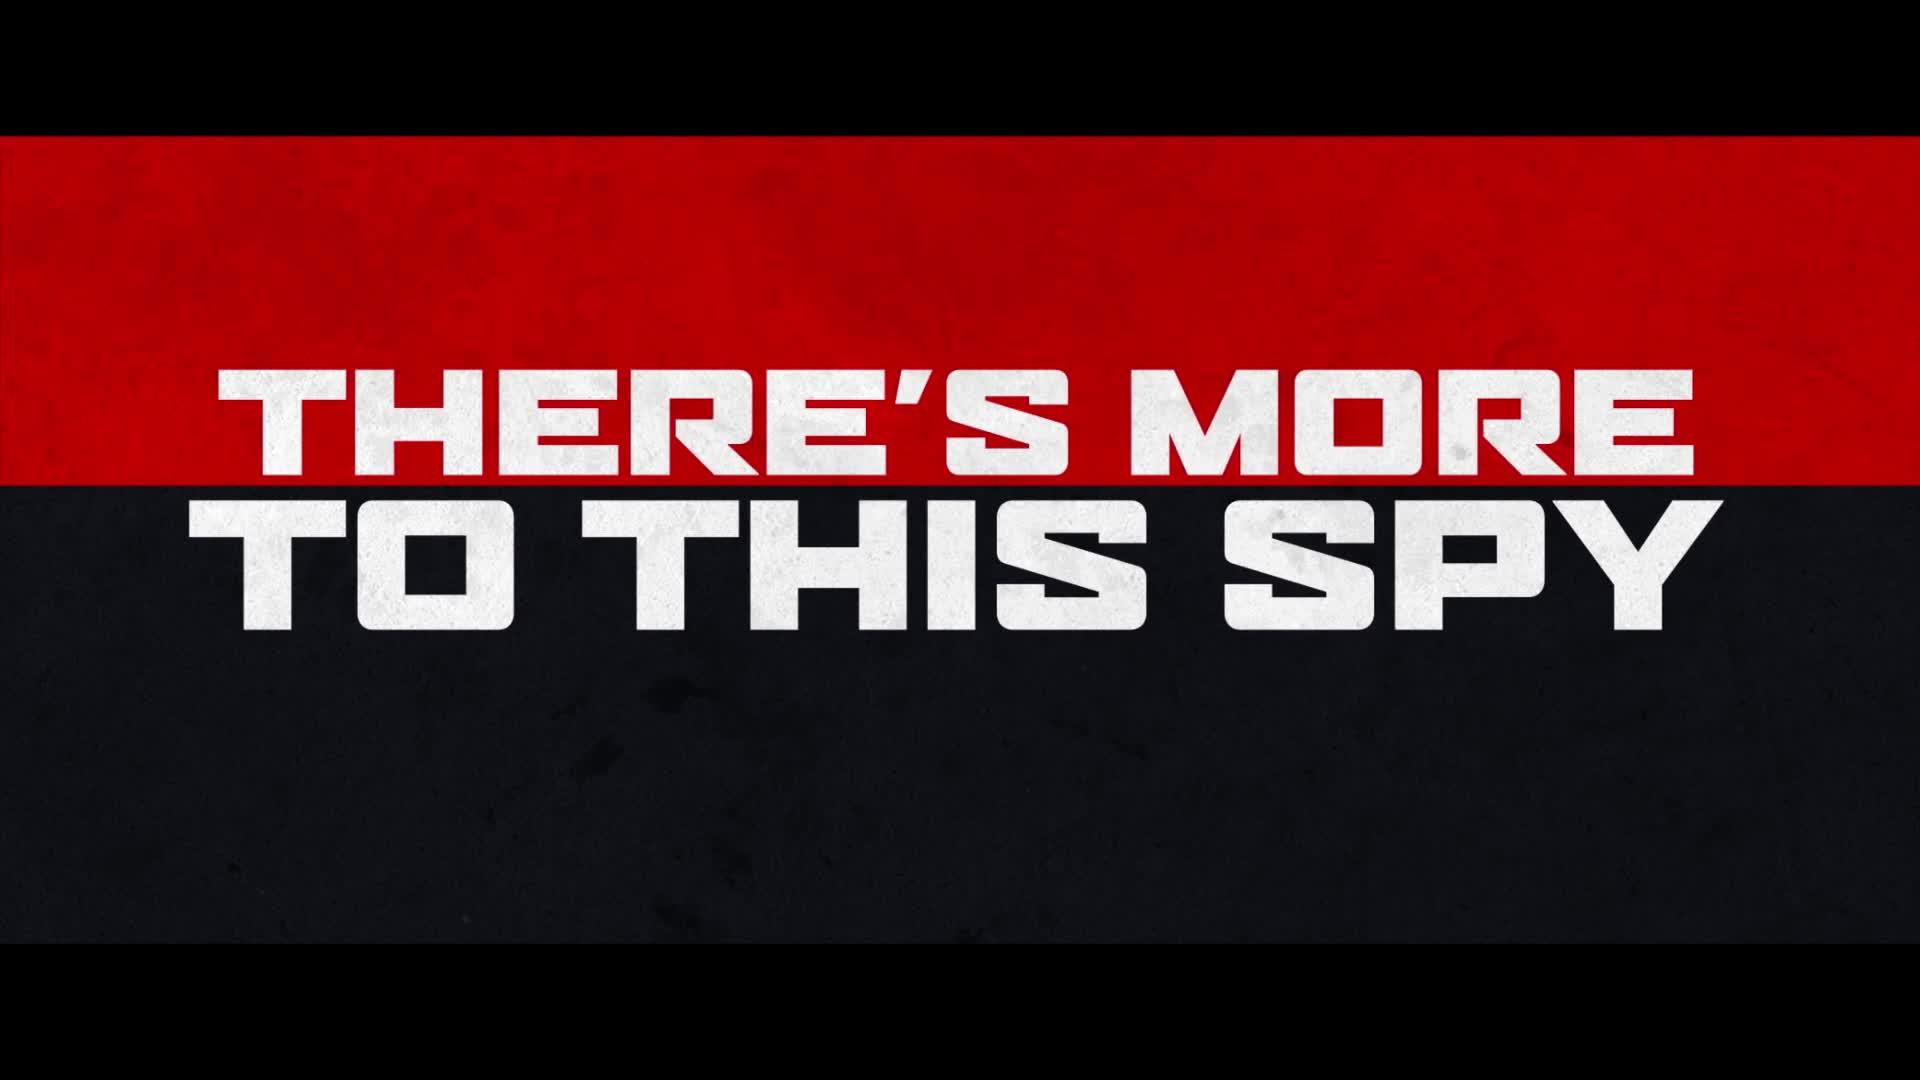 G-621 My Spy Movie 2019 In Control Dave Bautista Poster 24x36 27x40 32x48Inch